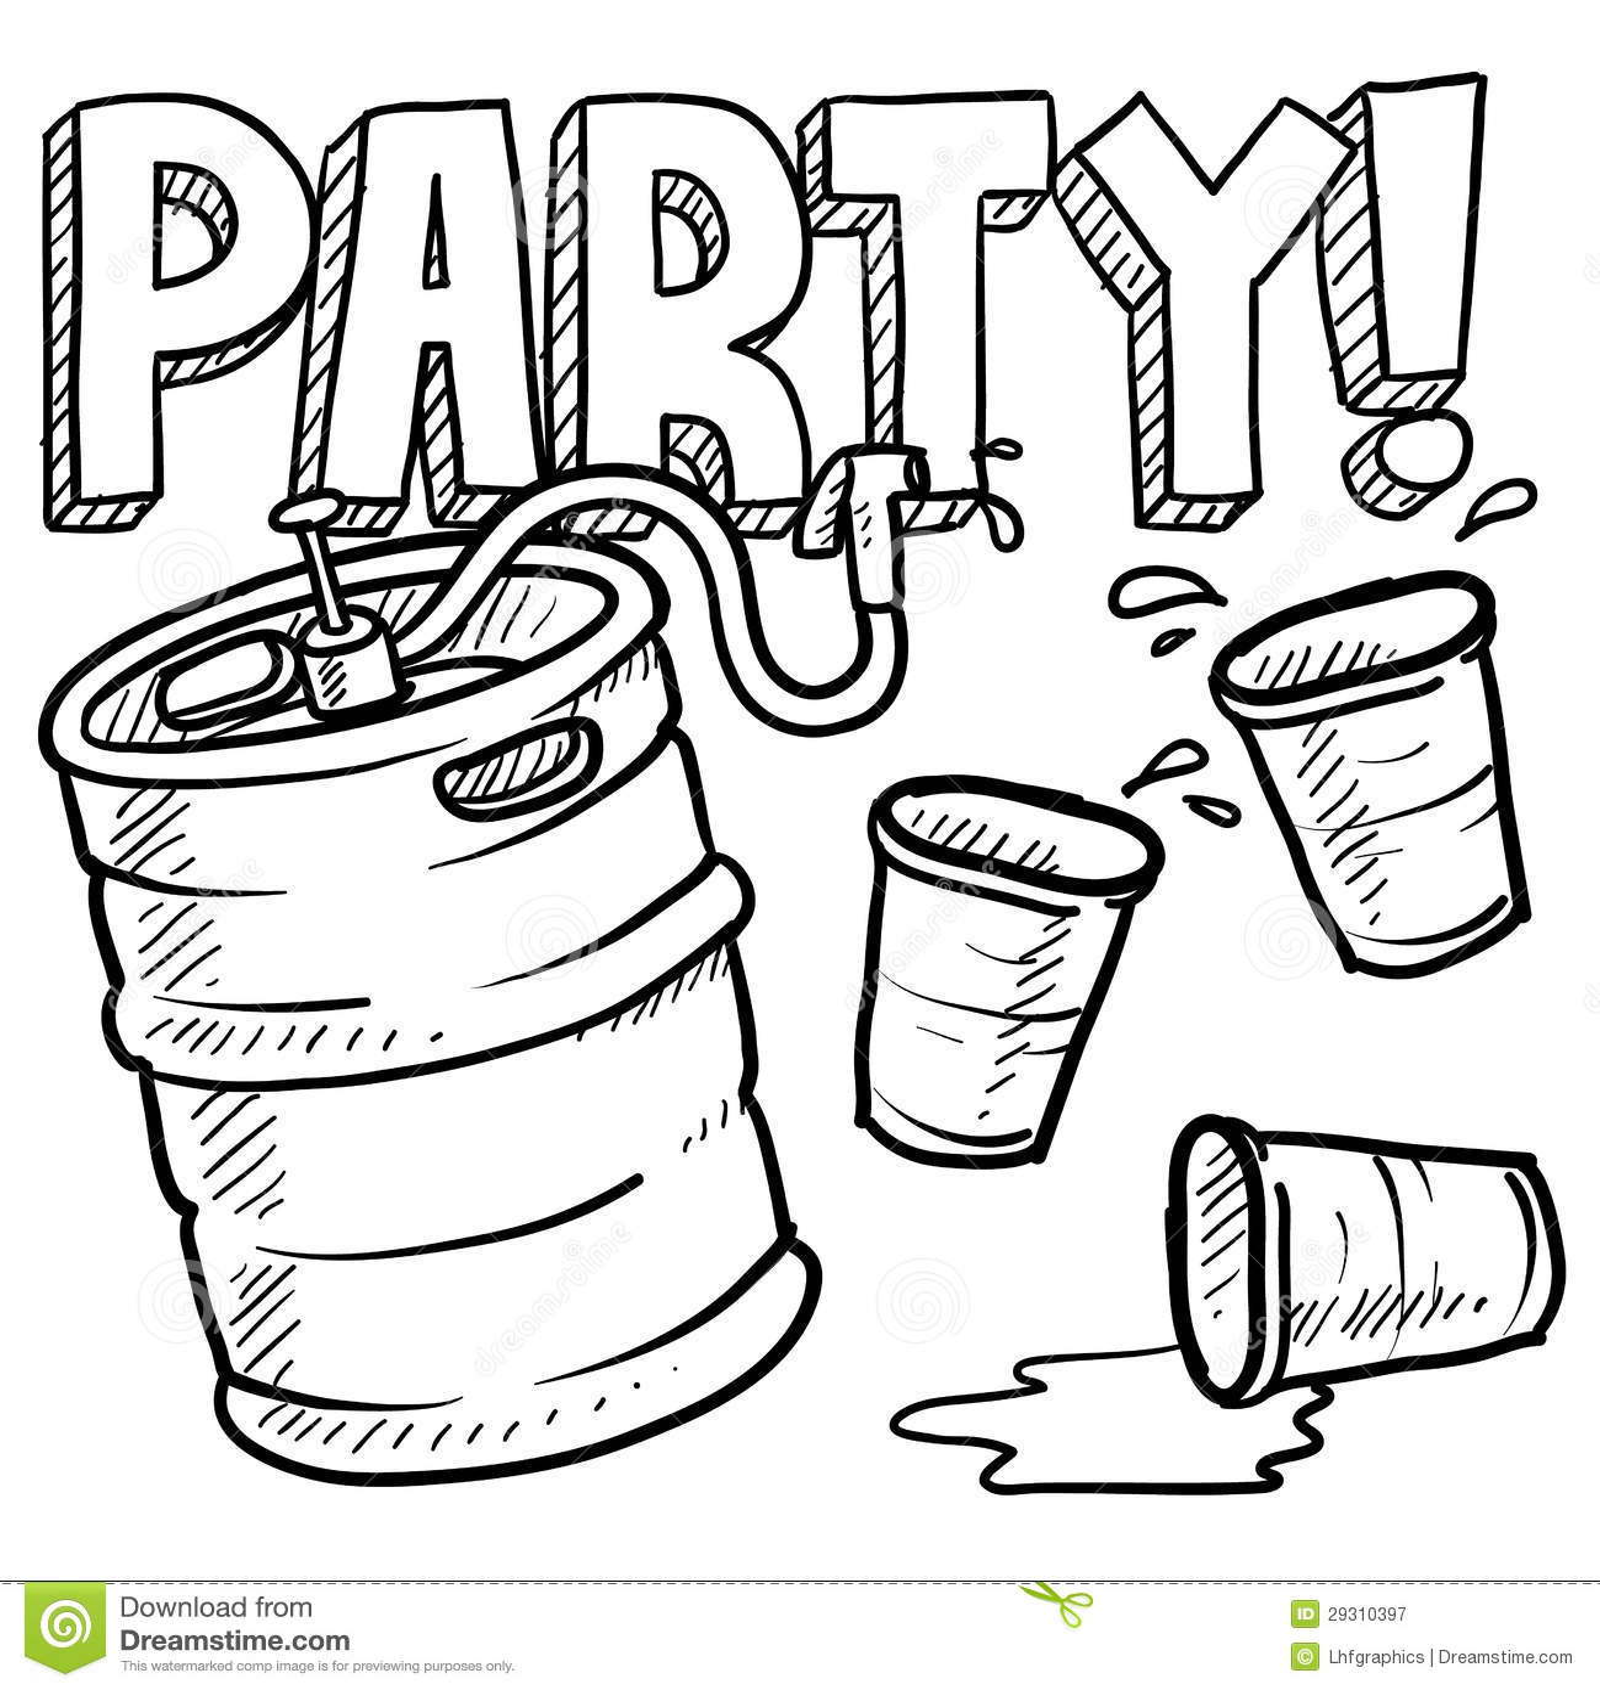 Frat Party Invite Image Collections Invitations Ideas Keg Monicamarmolfo